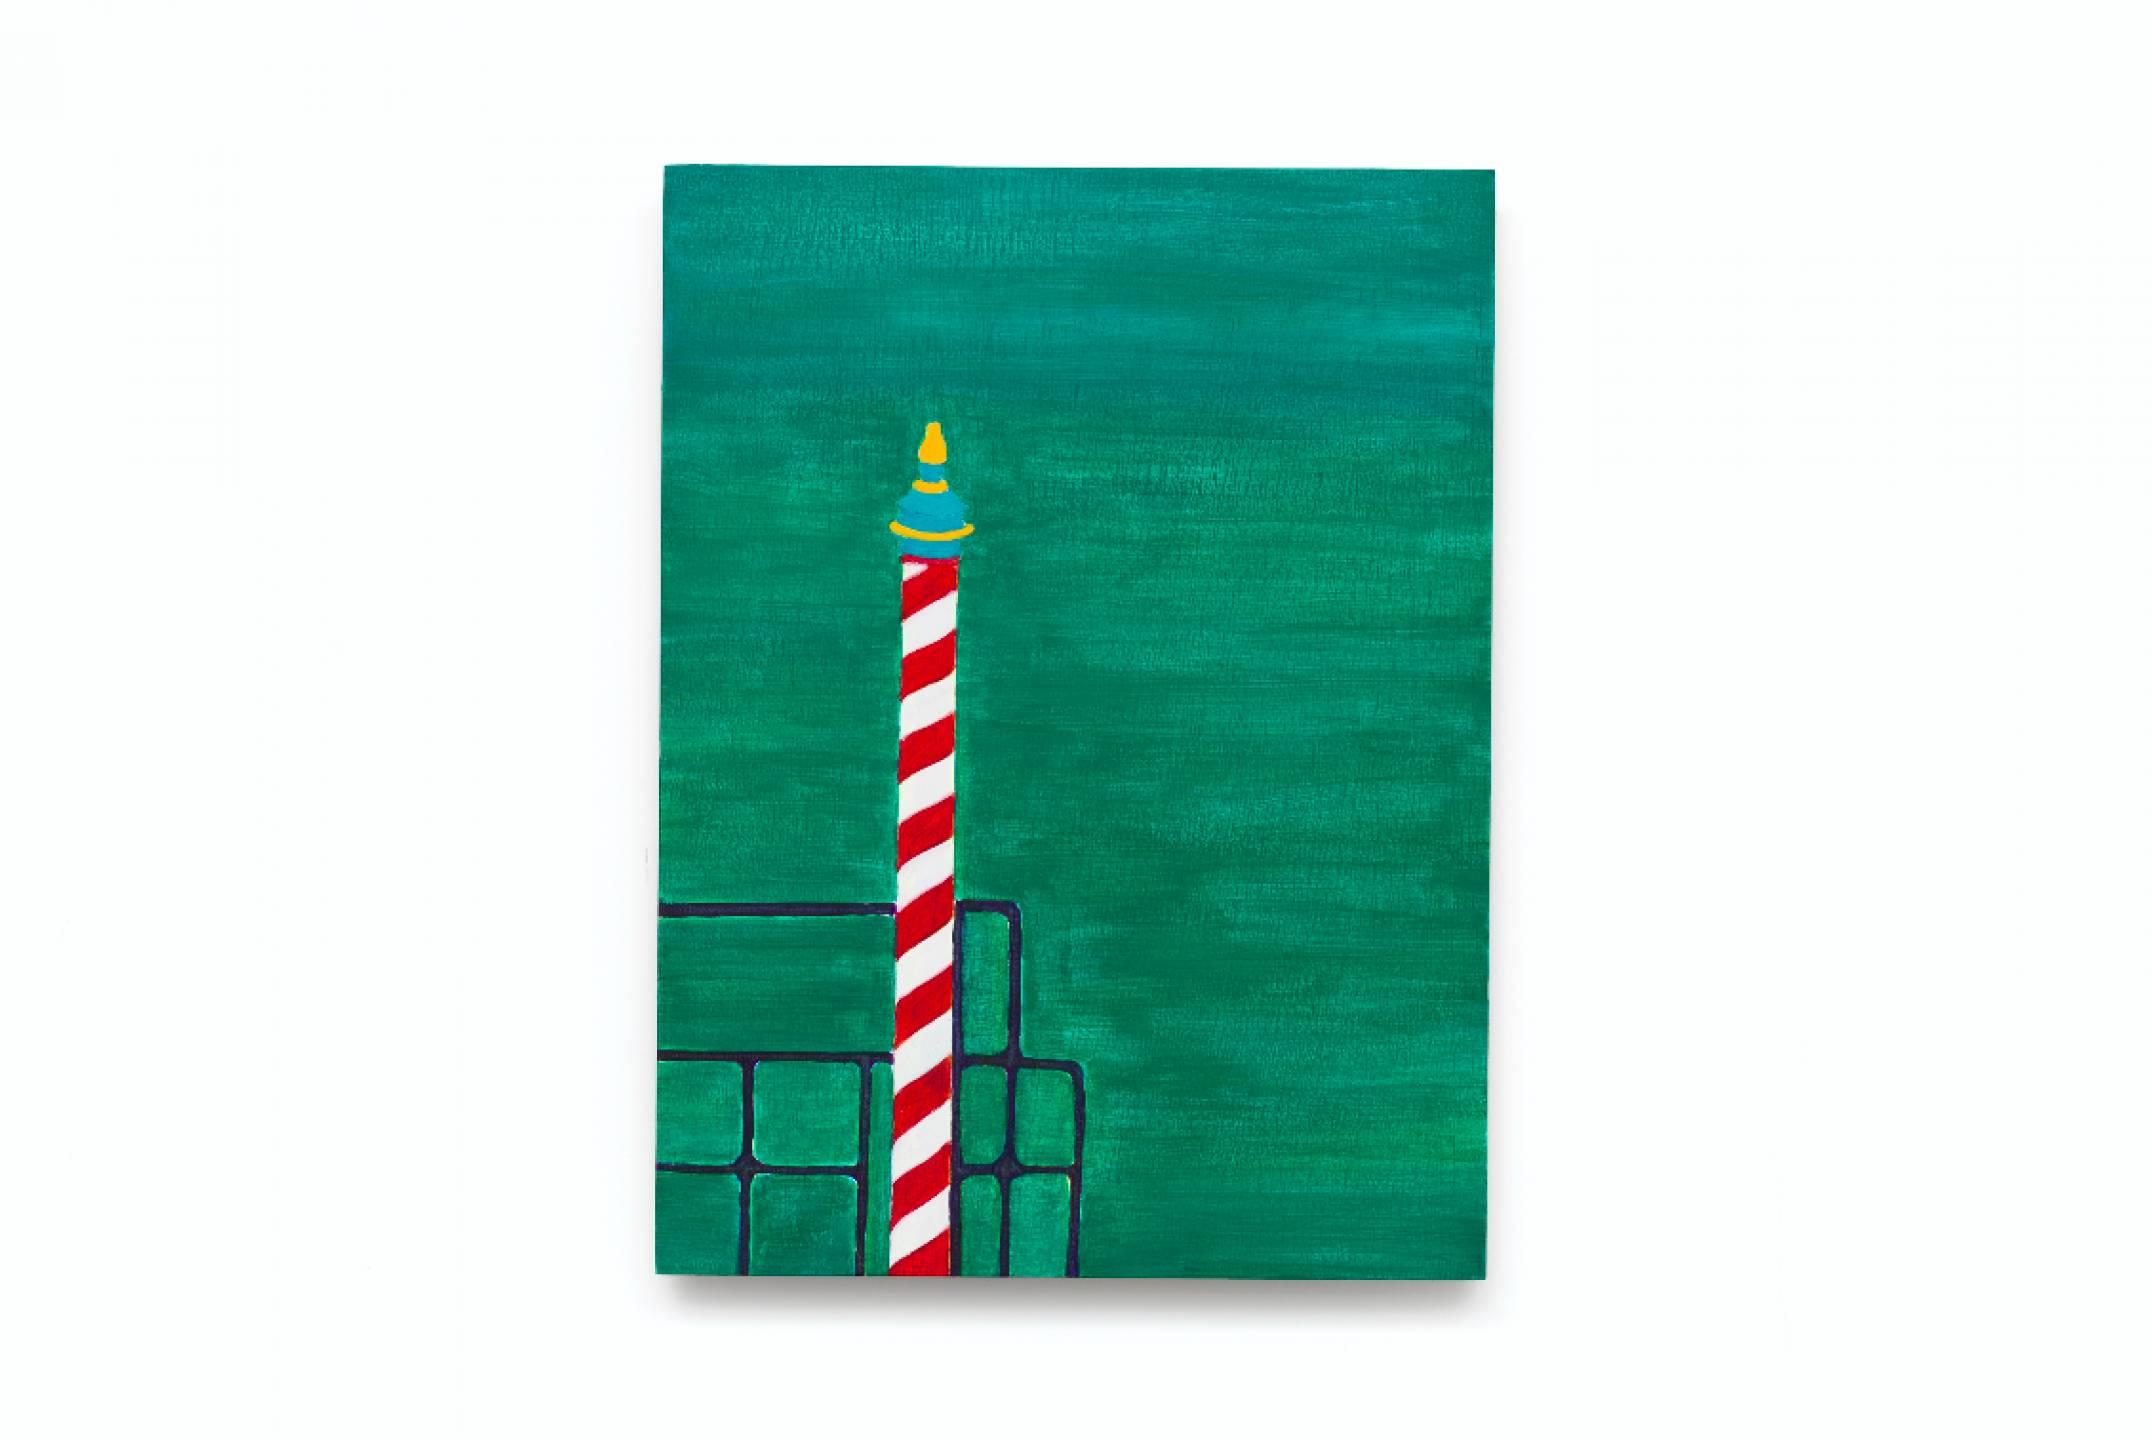 Patricia Leite, <em>untitled, from Veneza series</em>,2015, oil on wood, 40 ×30 cm - Mendes Wood DM